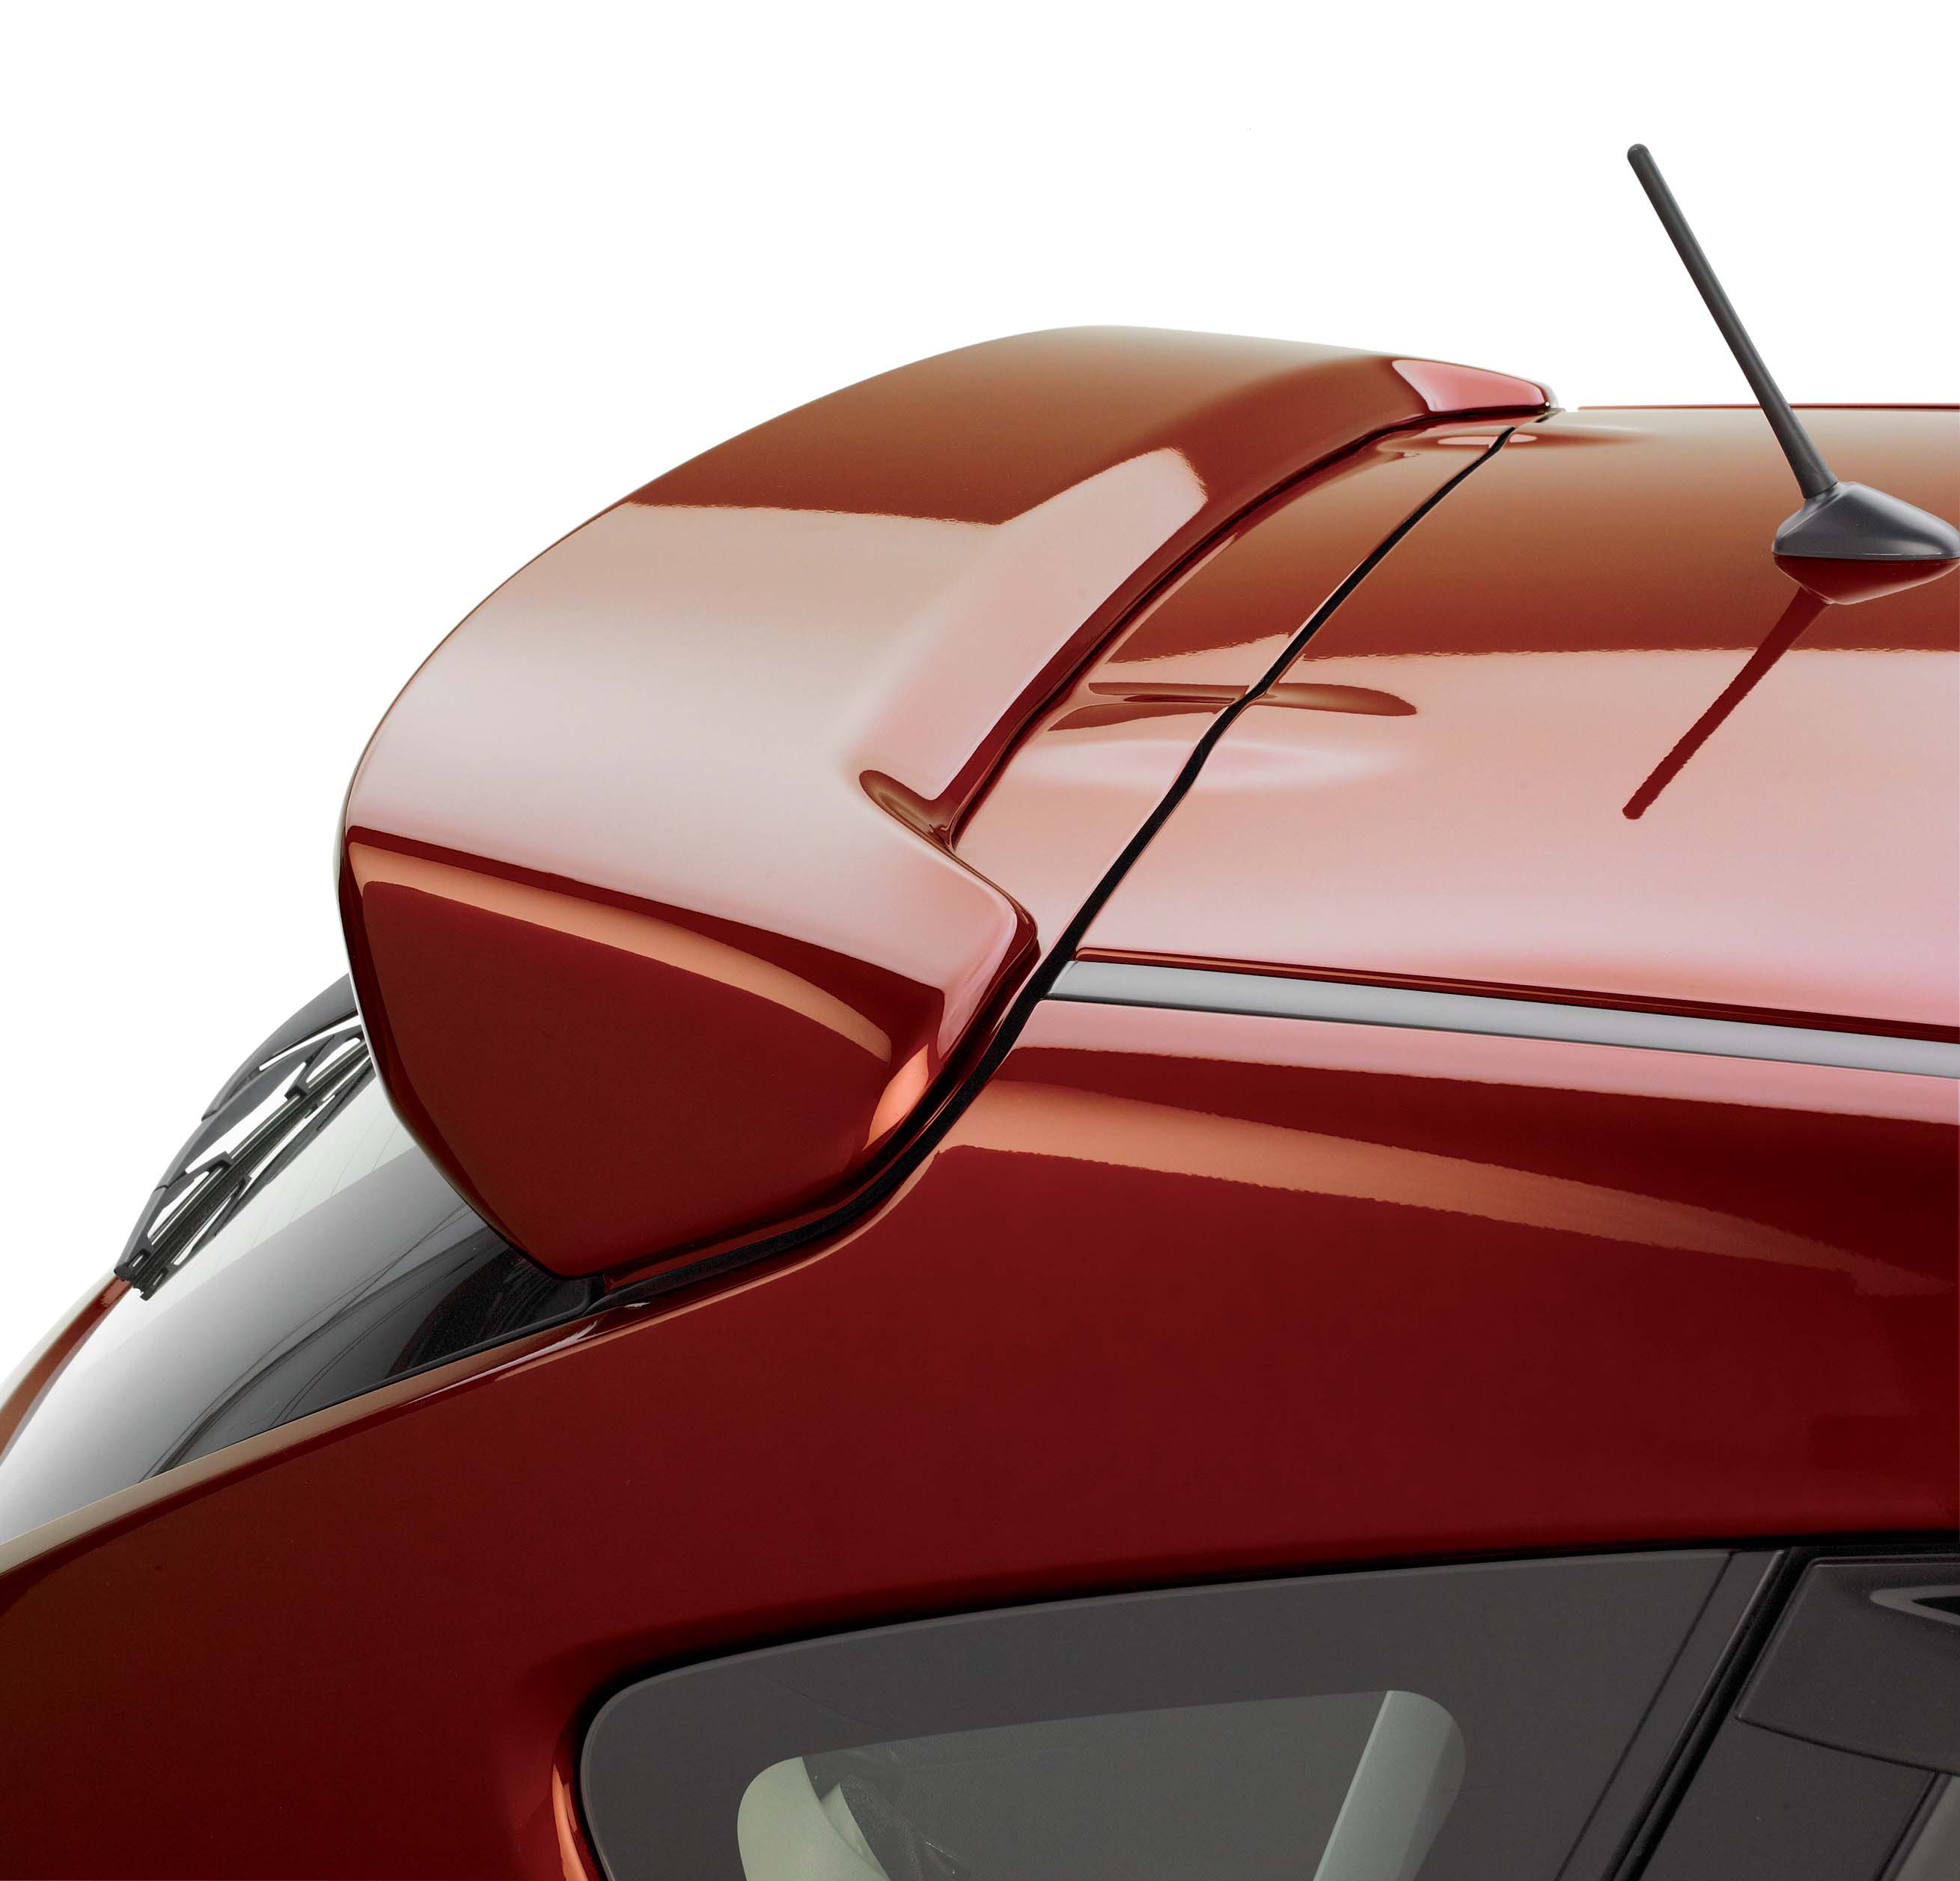 2016 Subaru Crosstrek Roof Spoiler 5Dr. Adds A Sporty